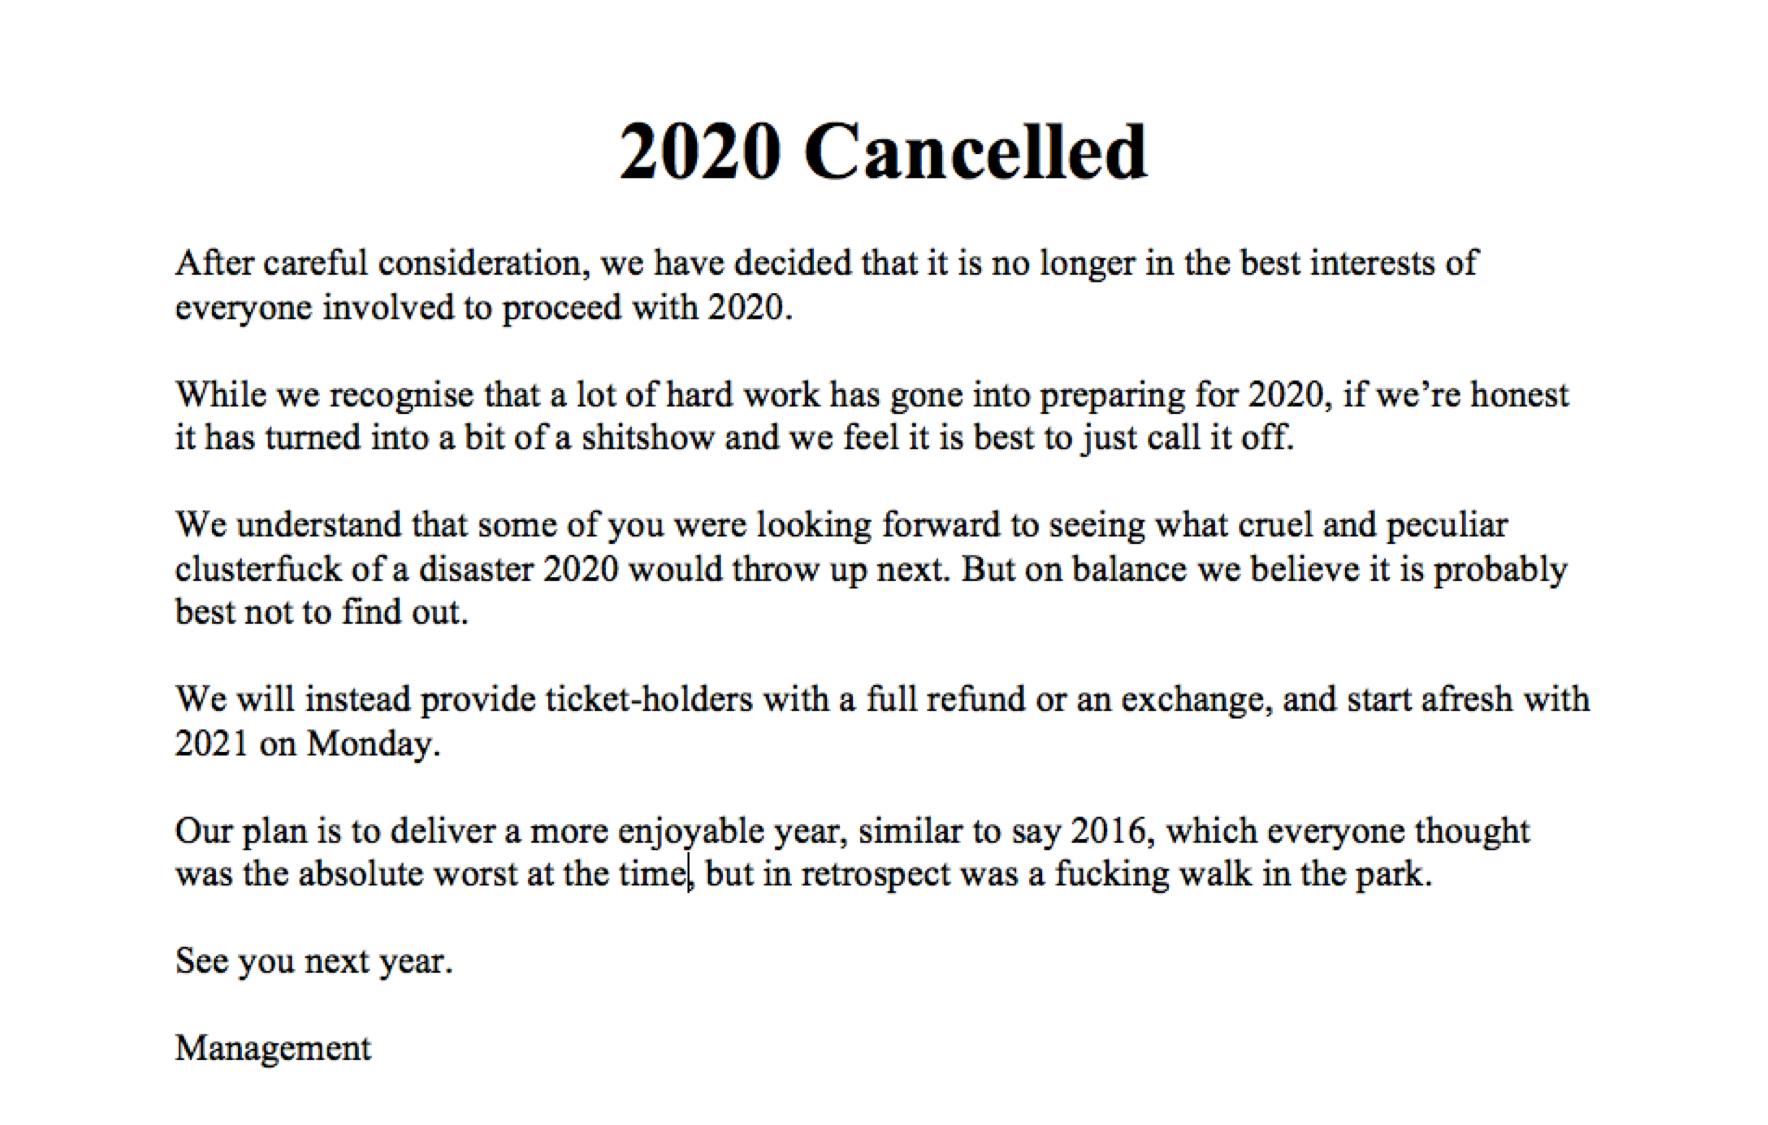 2020 cancelled meme